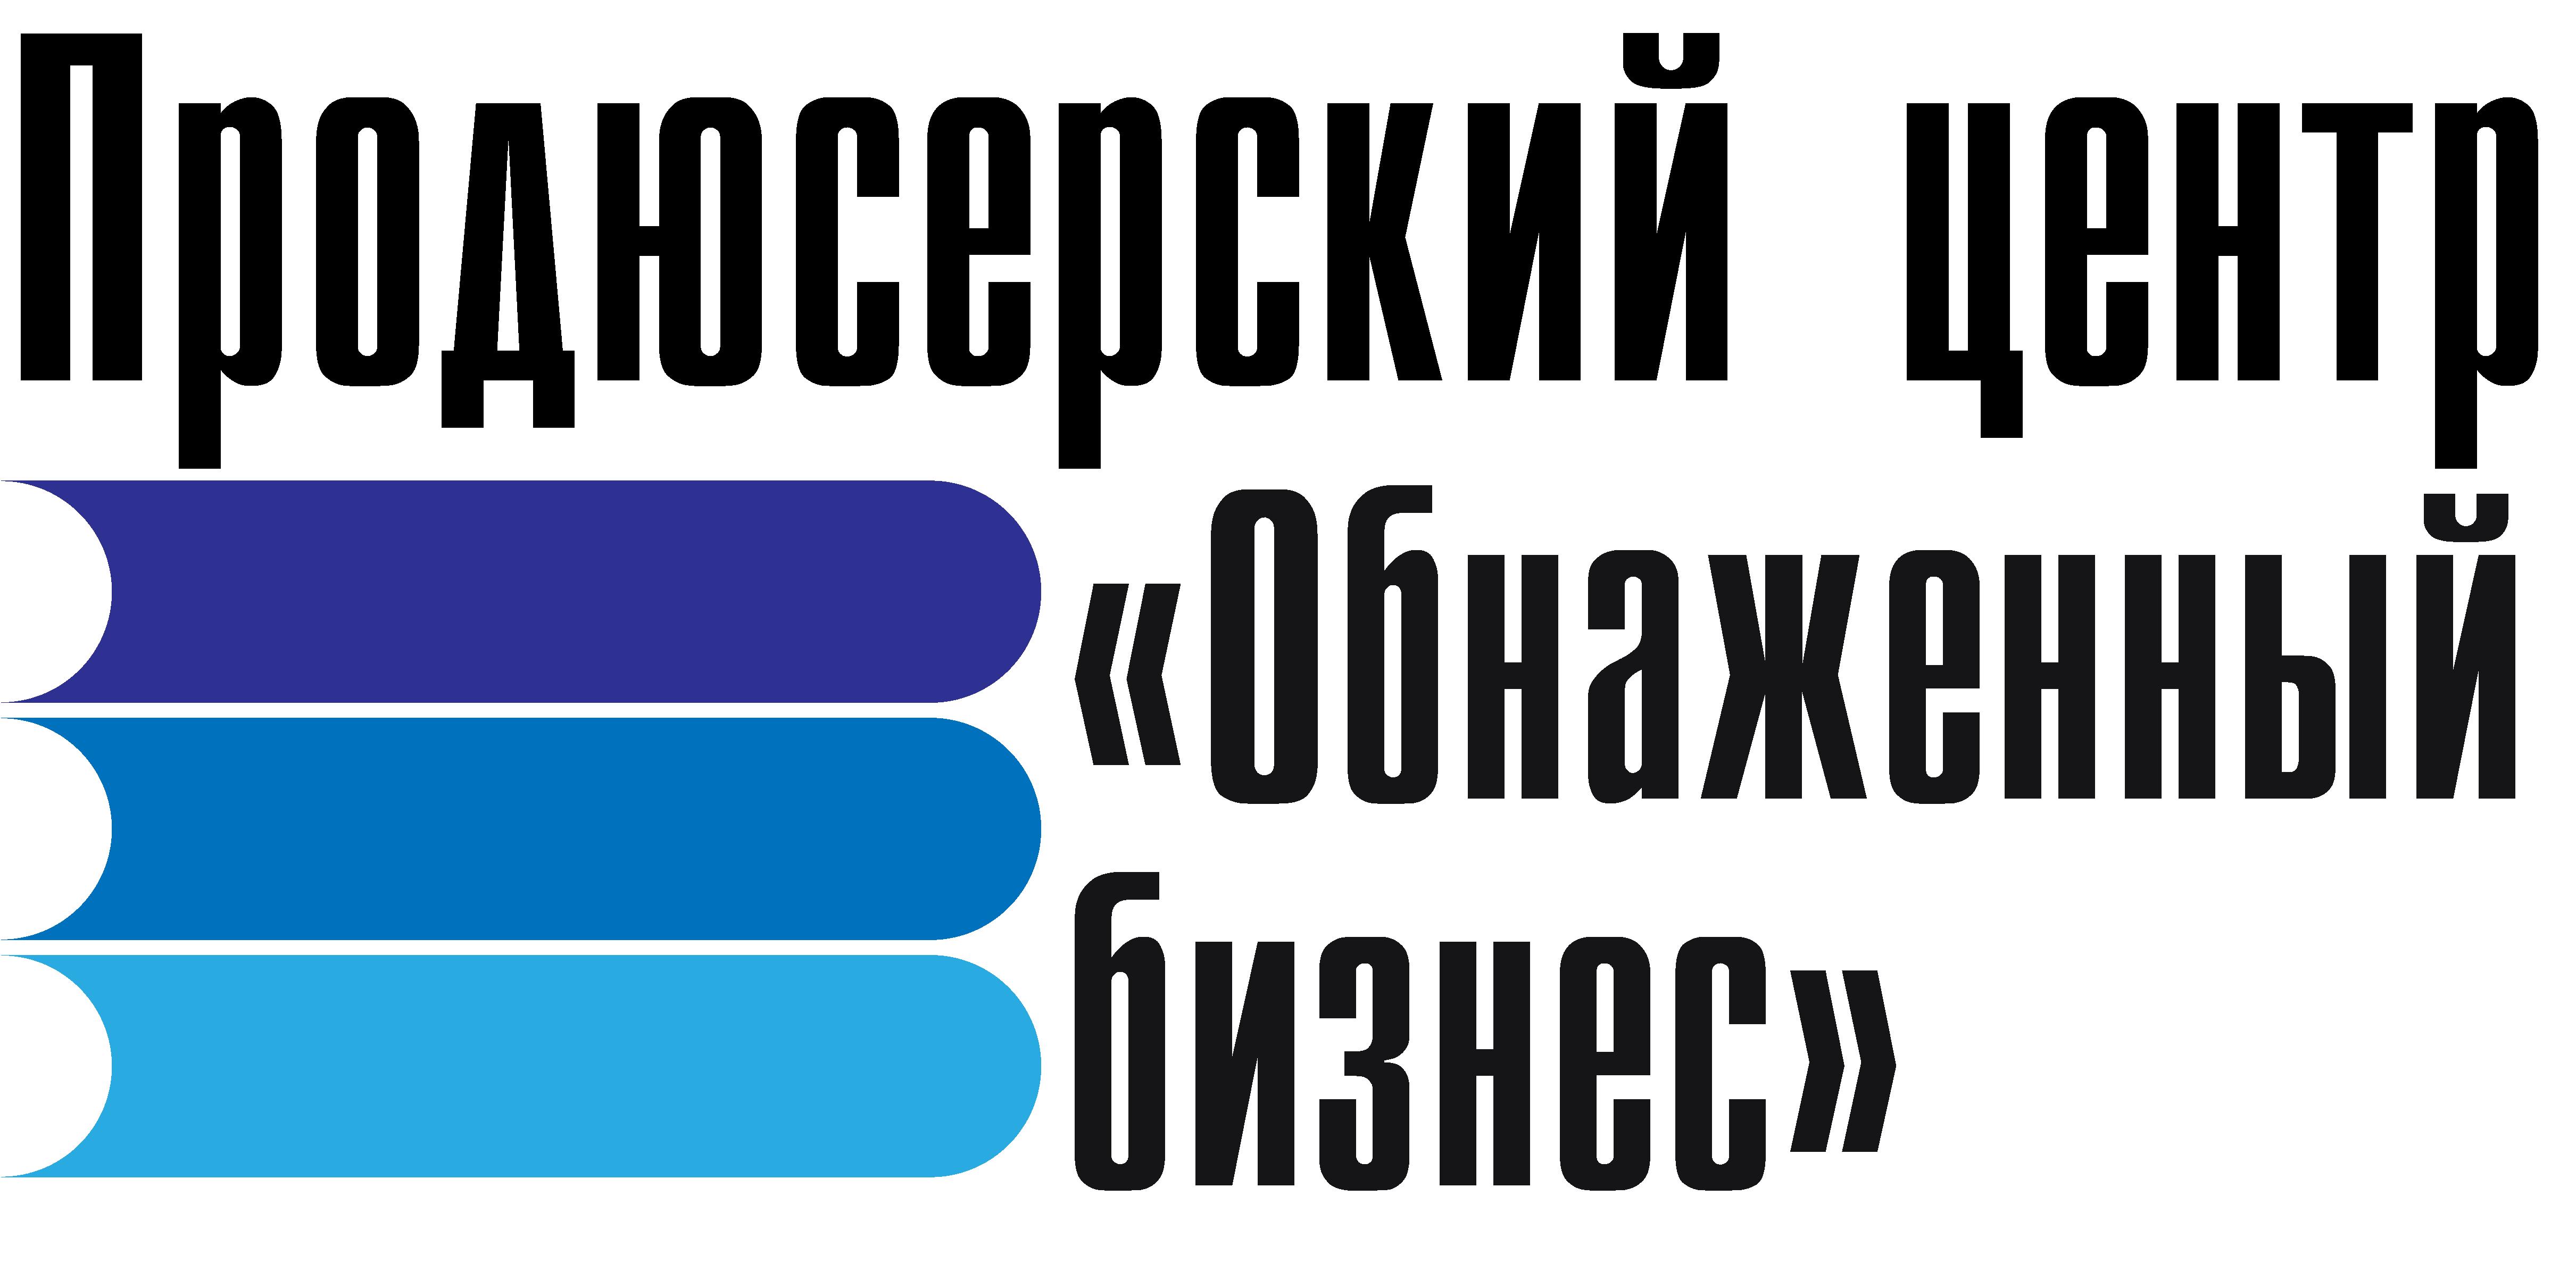 "Логотип для продюсерского центра ""Обнажённый бизнес"" фото f_7105b9d18fed5ed6.png"